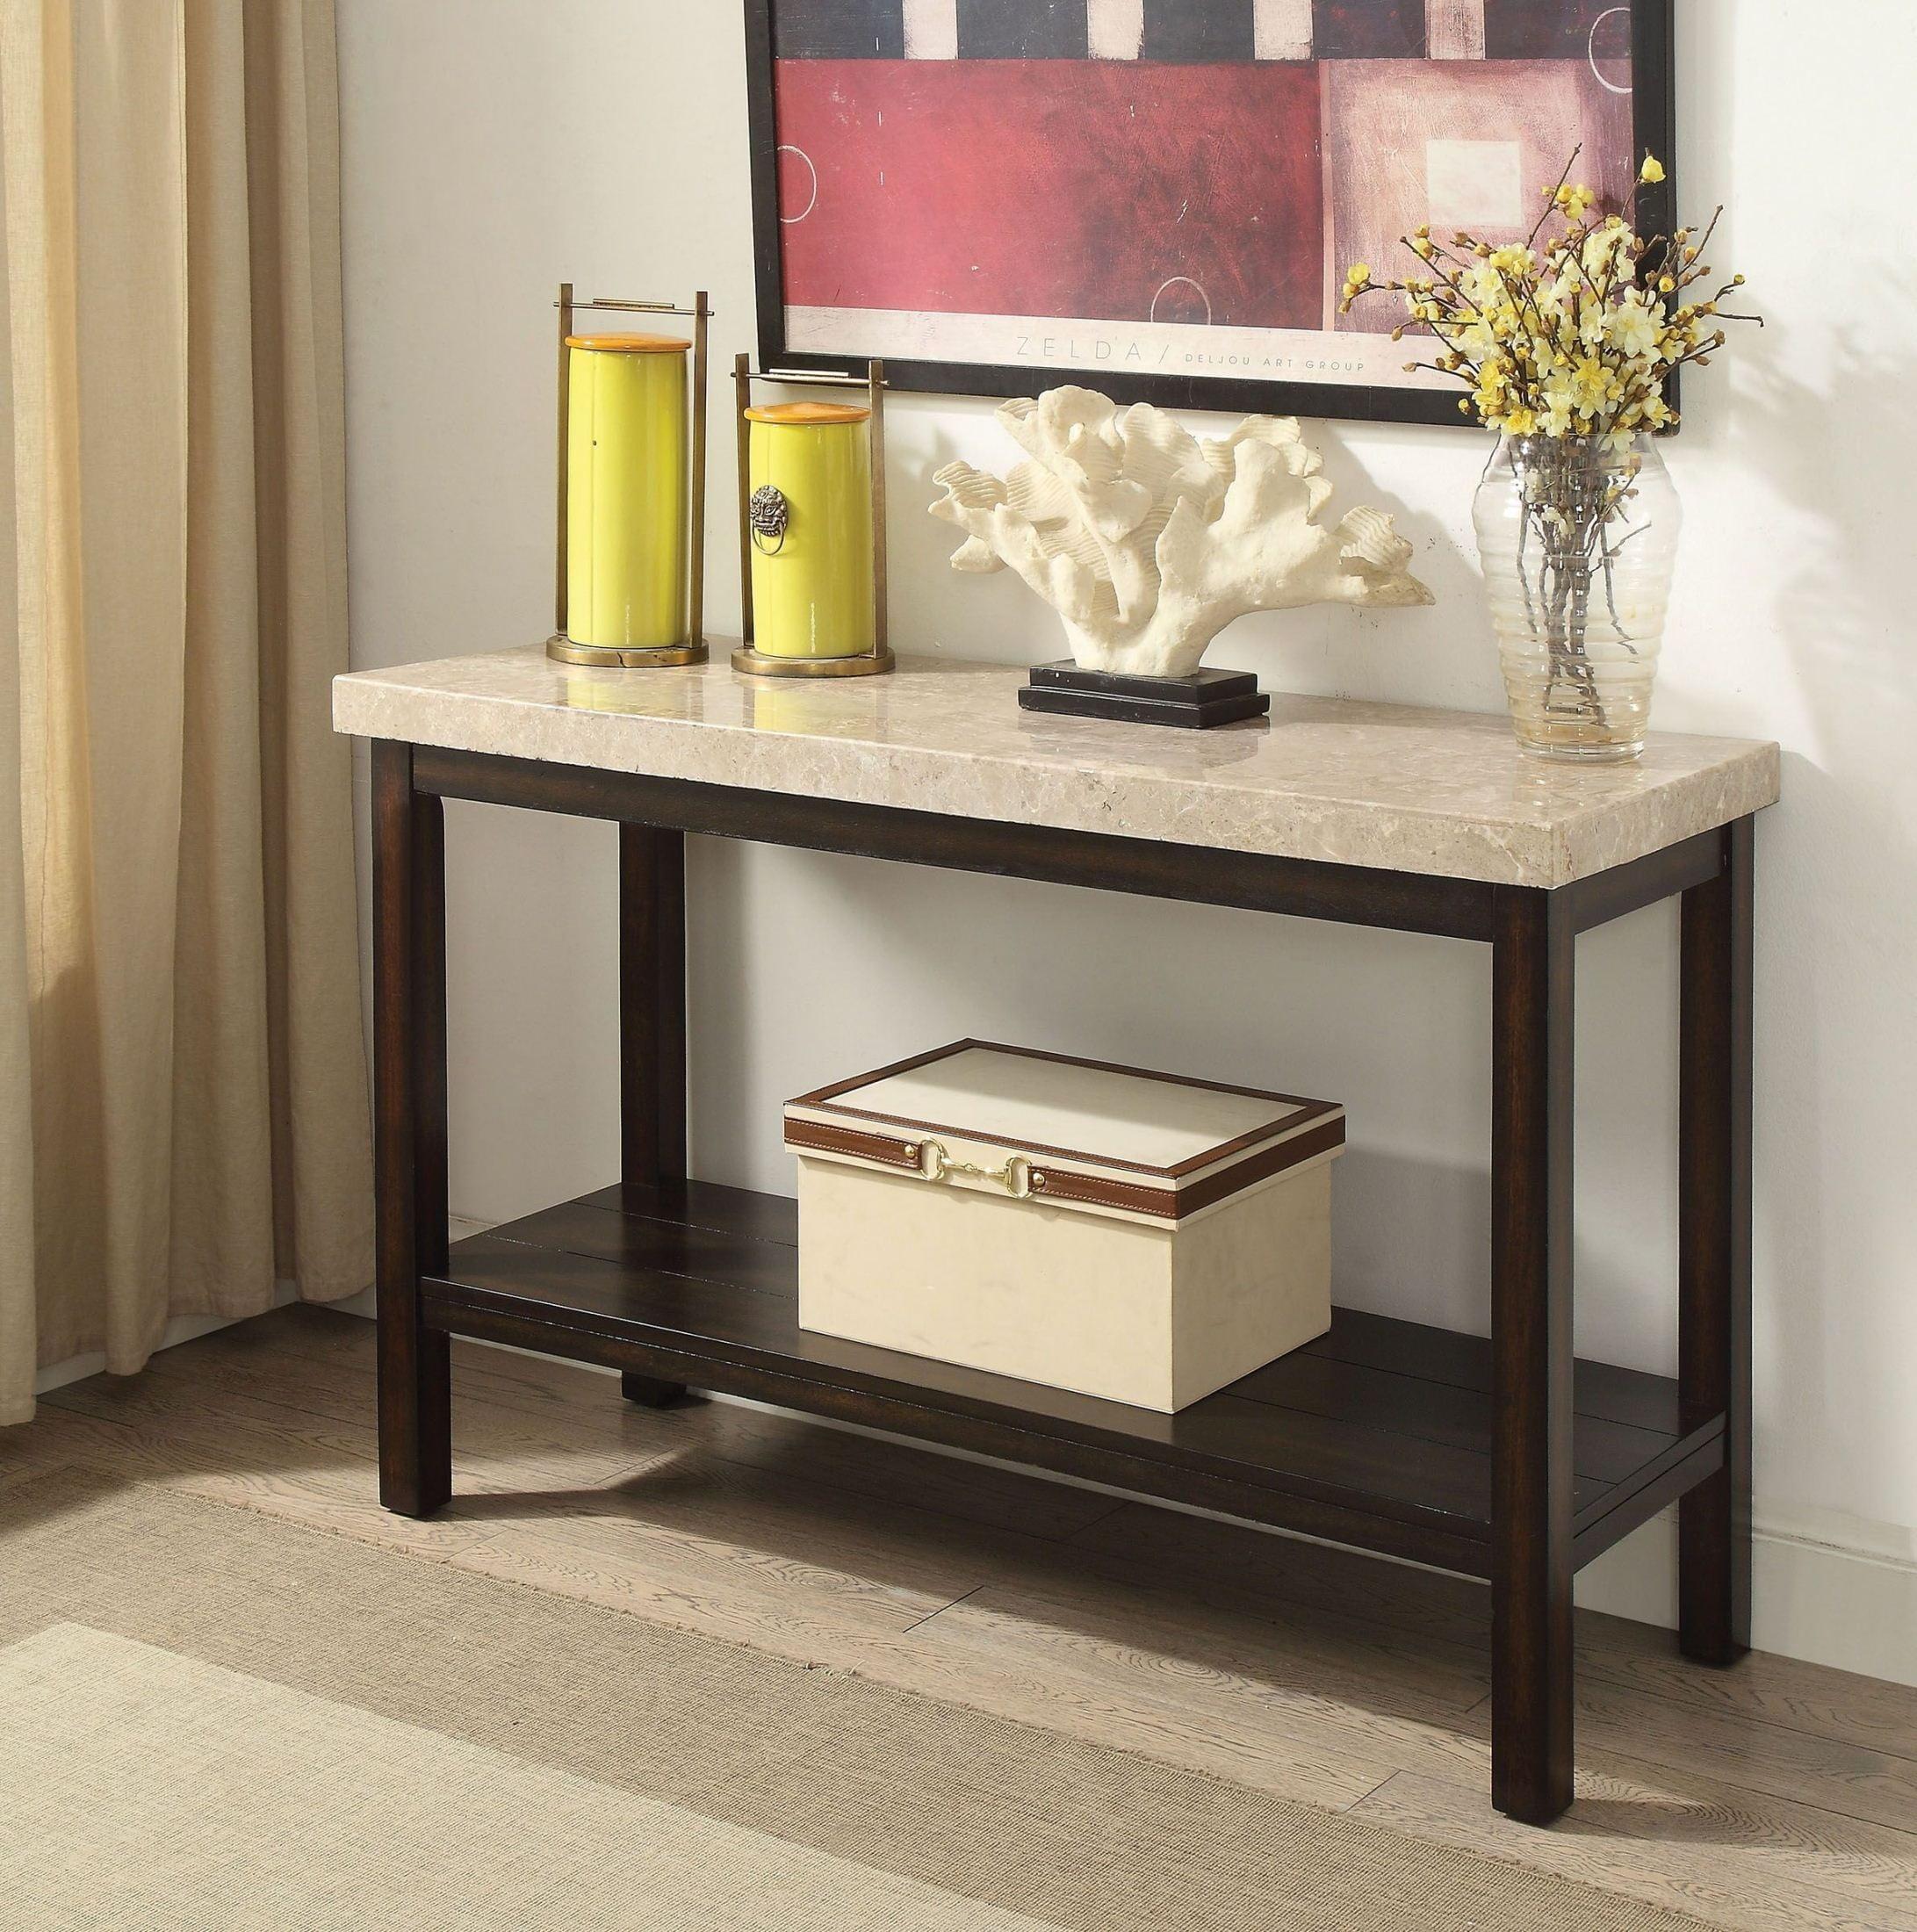 Marble Coffee Table Kijiji Calgary: Calgary Dark Walnut Sofa Table From Furniture Of America